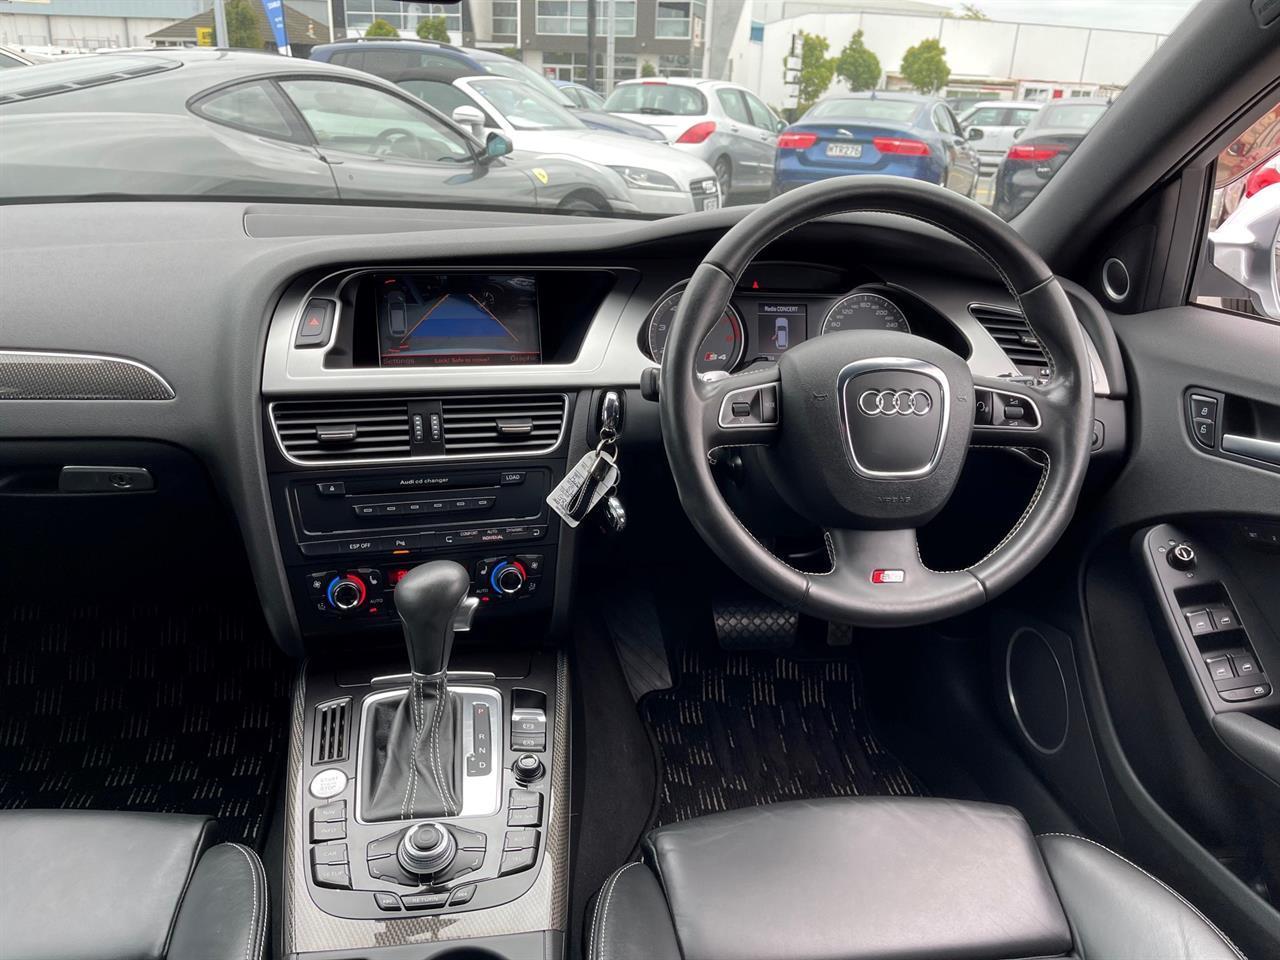 image-10, 2009 Audi S4 3.0 V6 Supercharged TFSI Quattro Wago at Christchurch